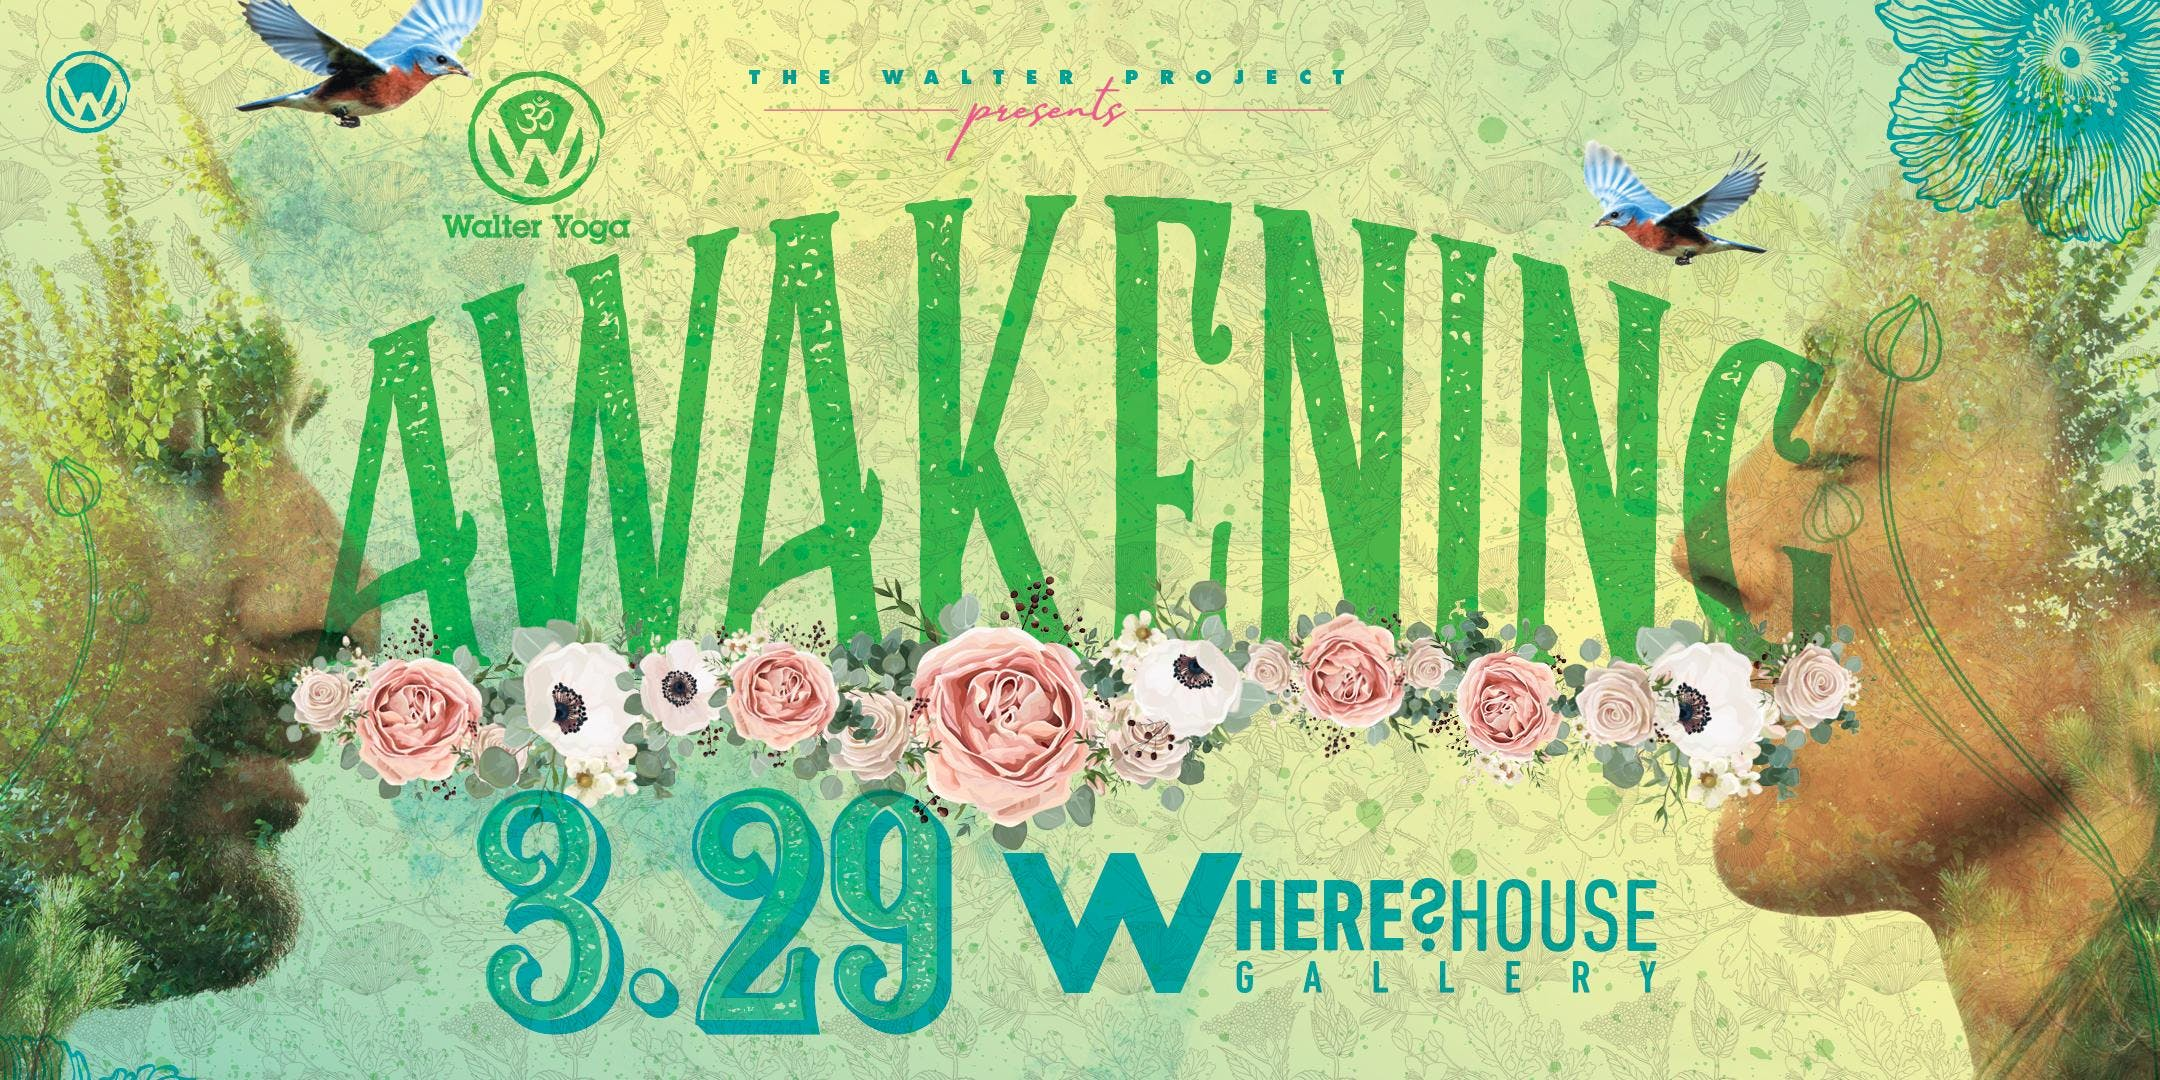 AWAKENING - The Walter Yoga Experience